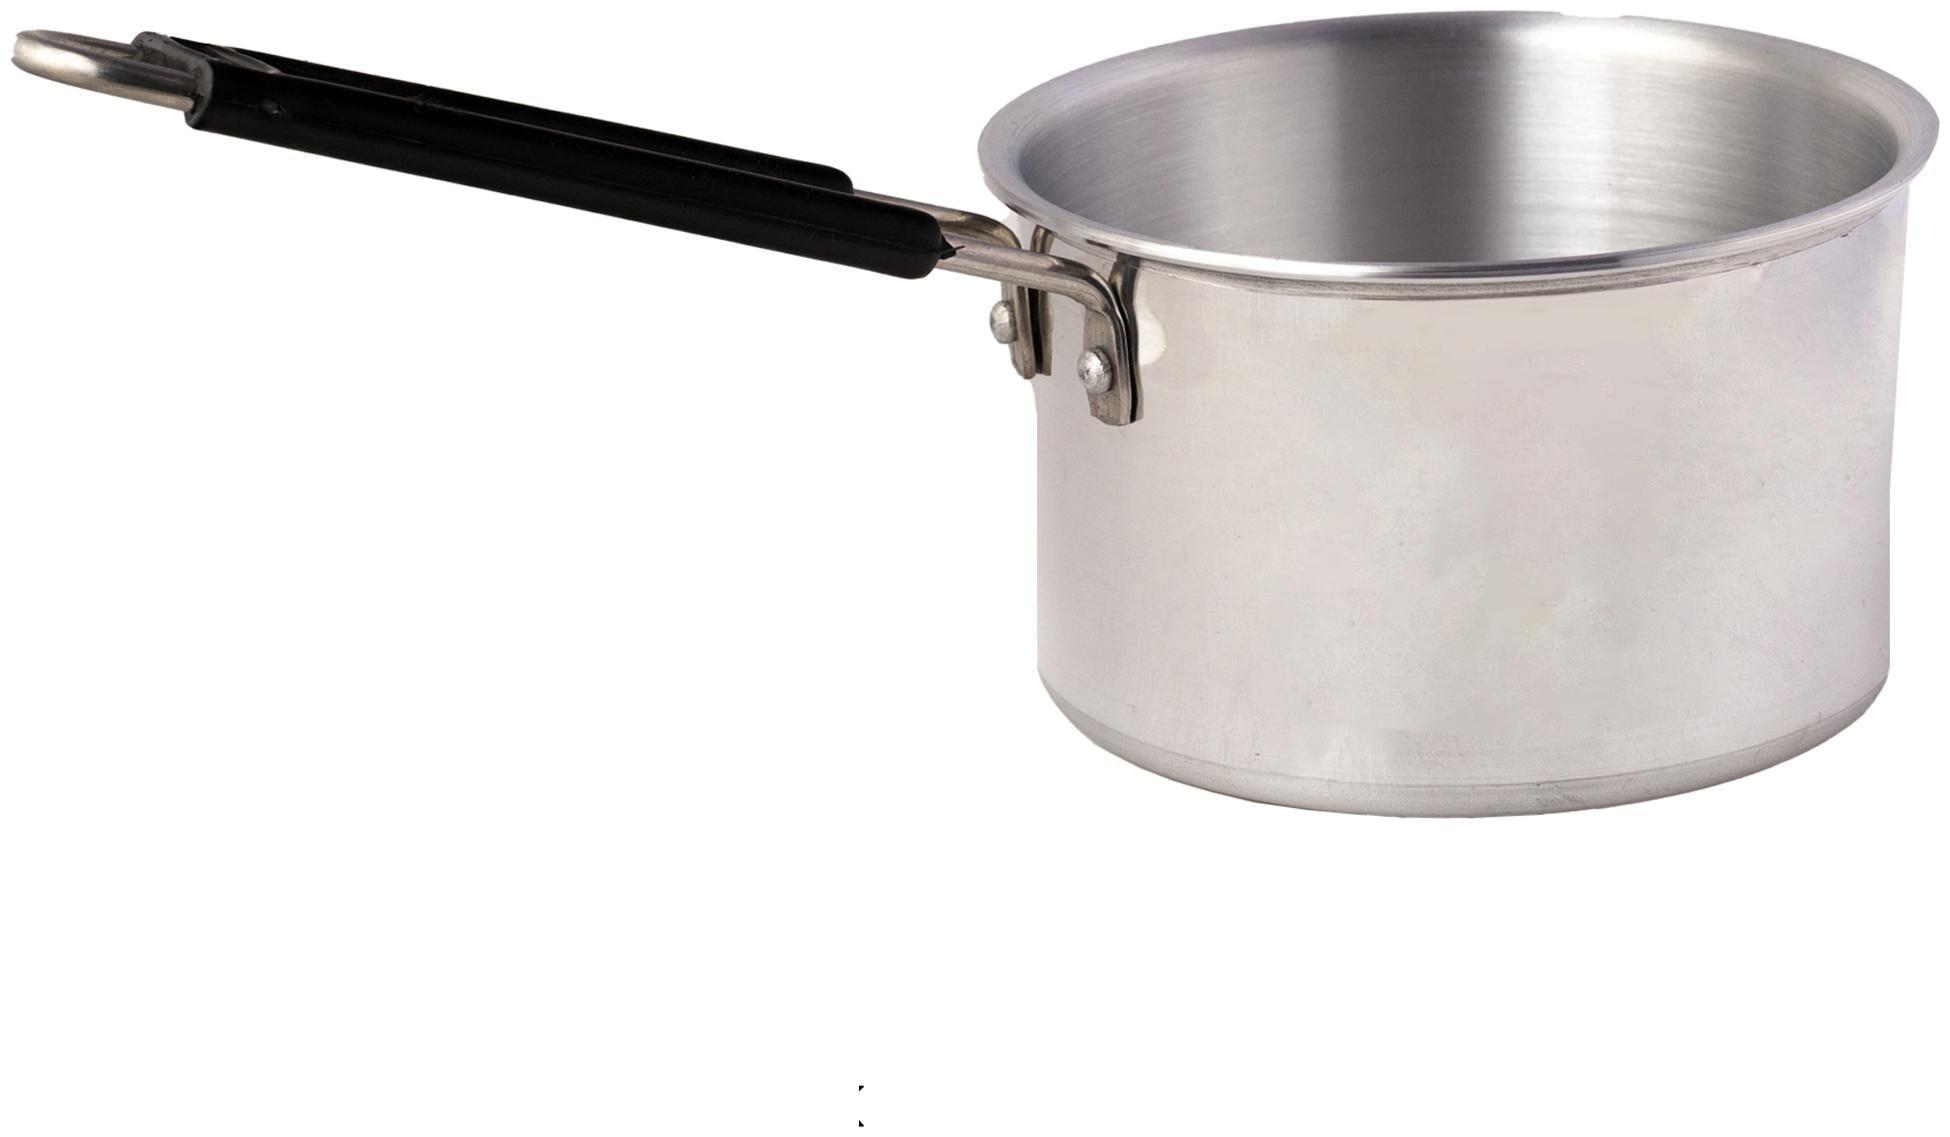 ROLIMOLI With Lid Fry Pan Induction Bottom 16 cm Diameter   Stainless Steel , Set of 1   by Prachi International